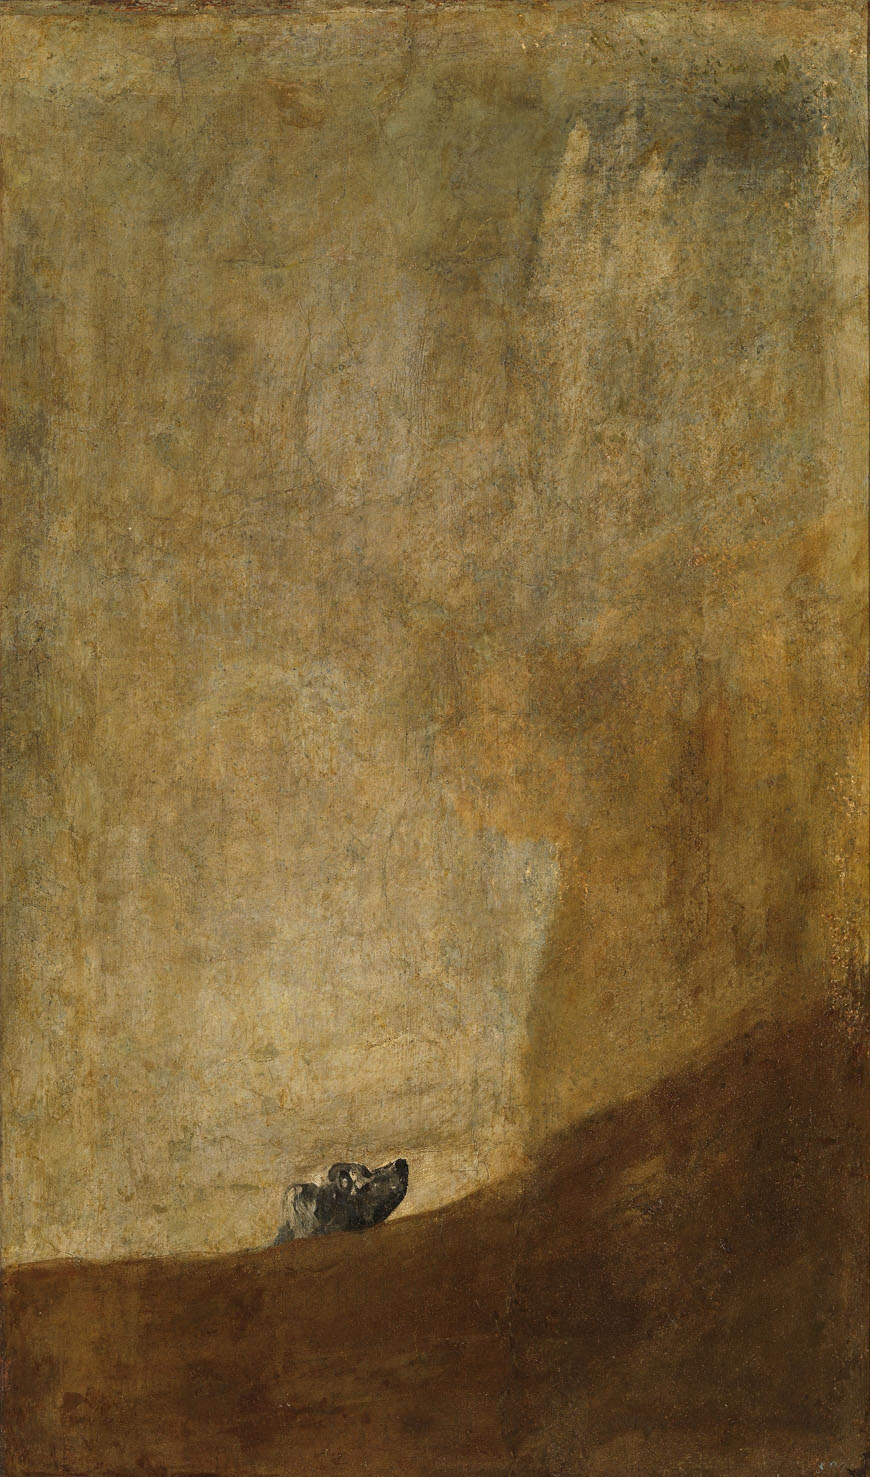 Museo Nacional del Prado Madrid dog Goya